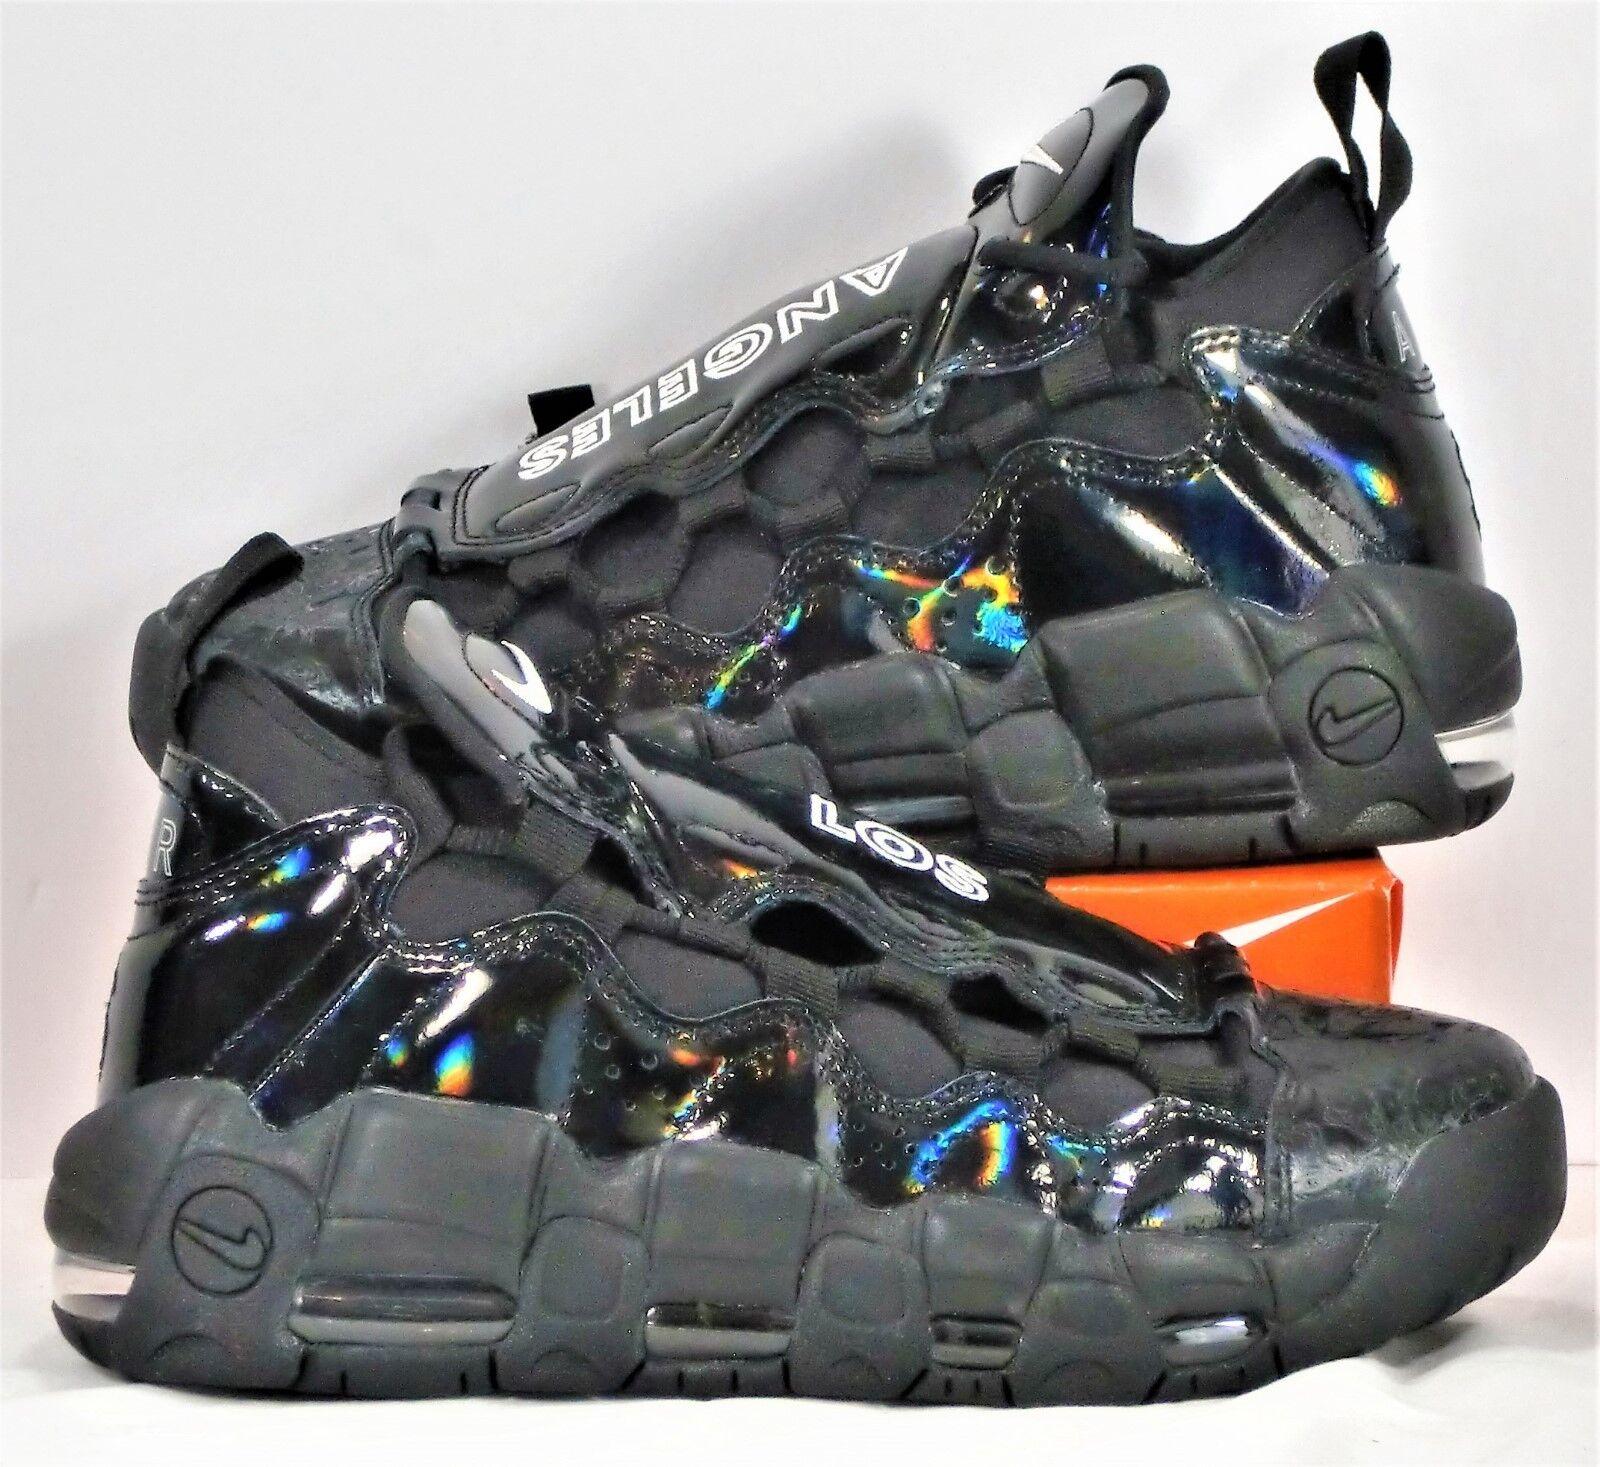 Nike air piu 'soldi lx ritmo bianco nero scarpe da basket sz 6 nuovi aj1312 002